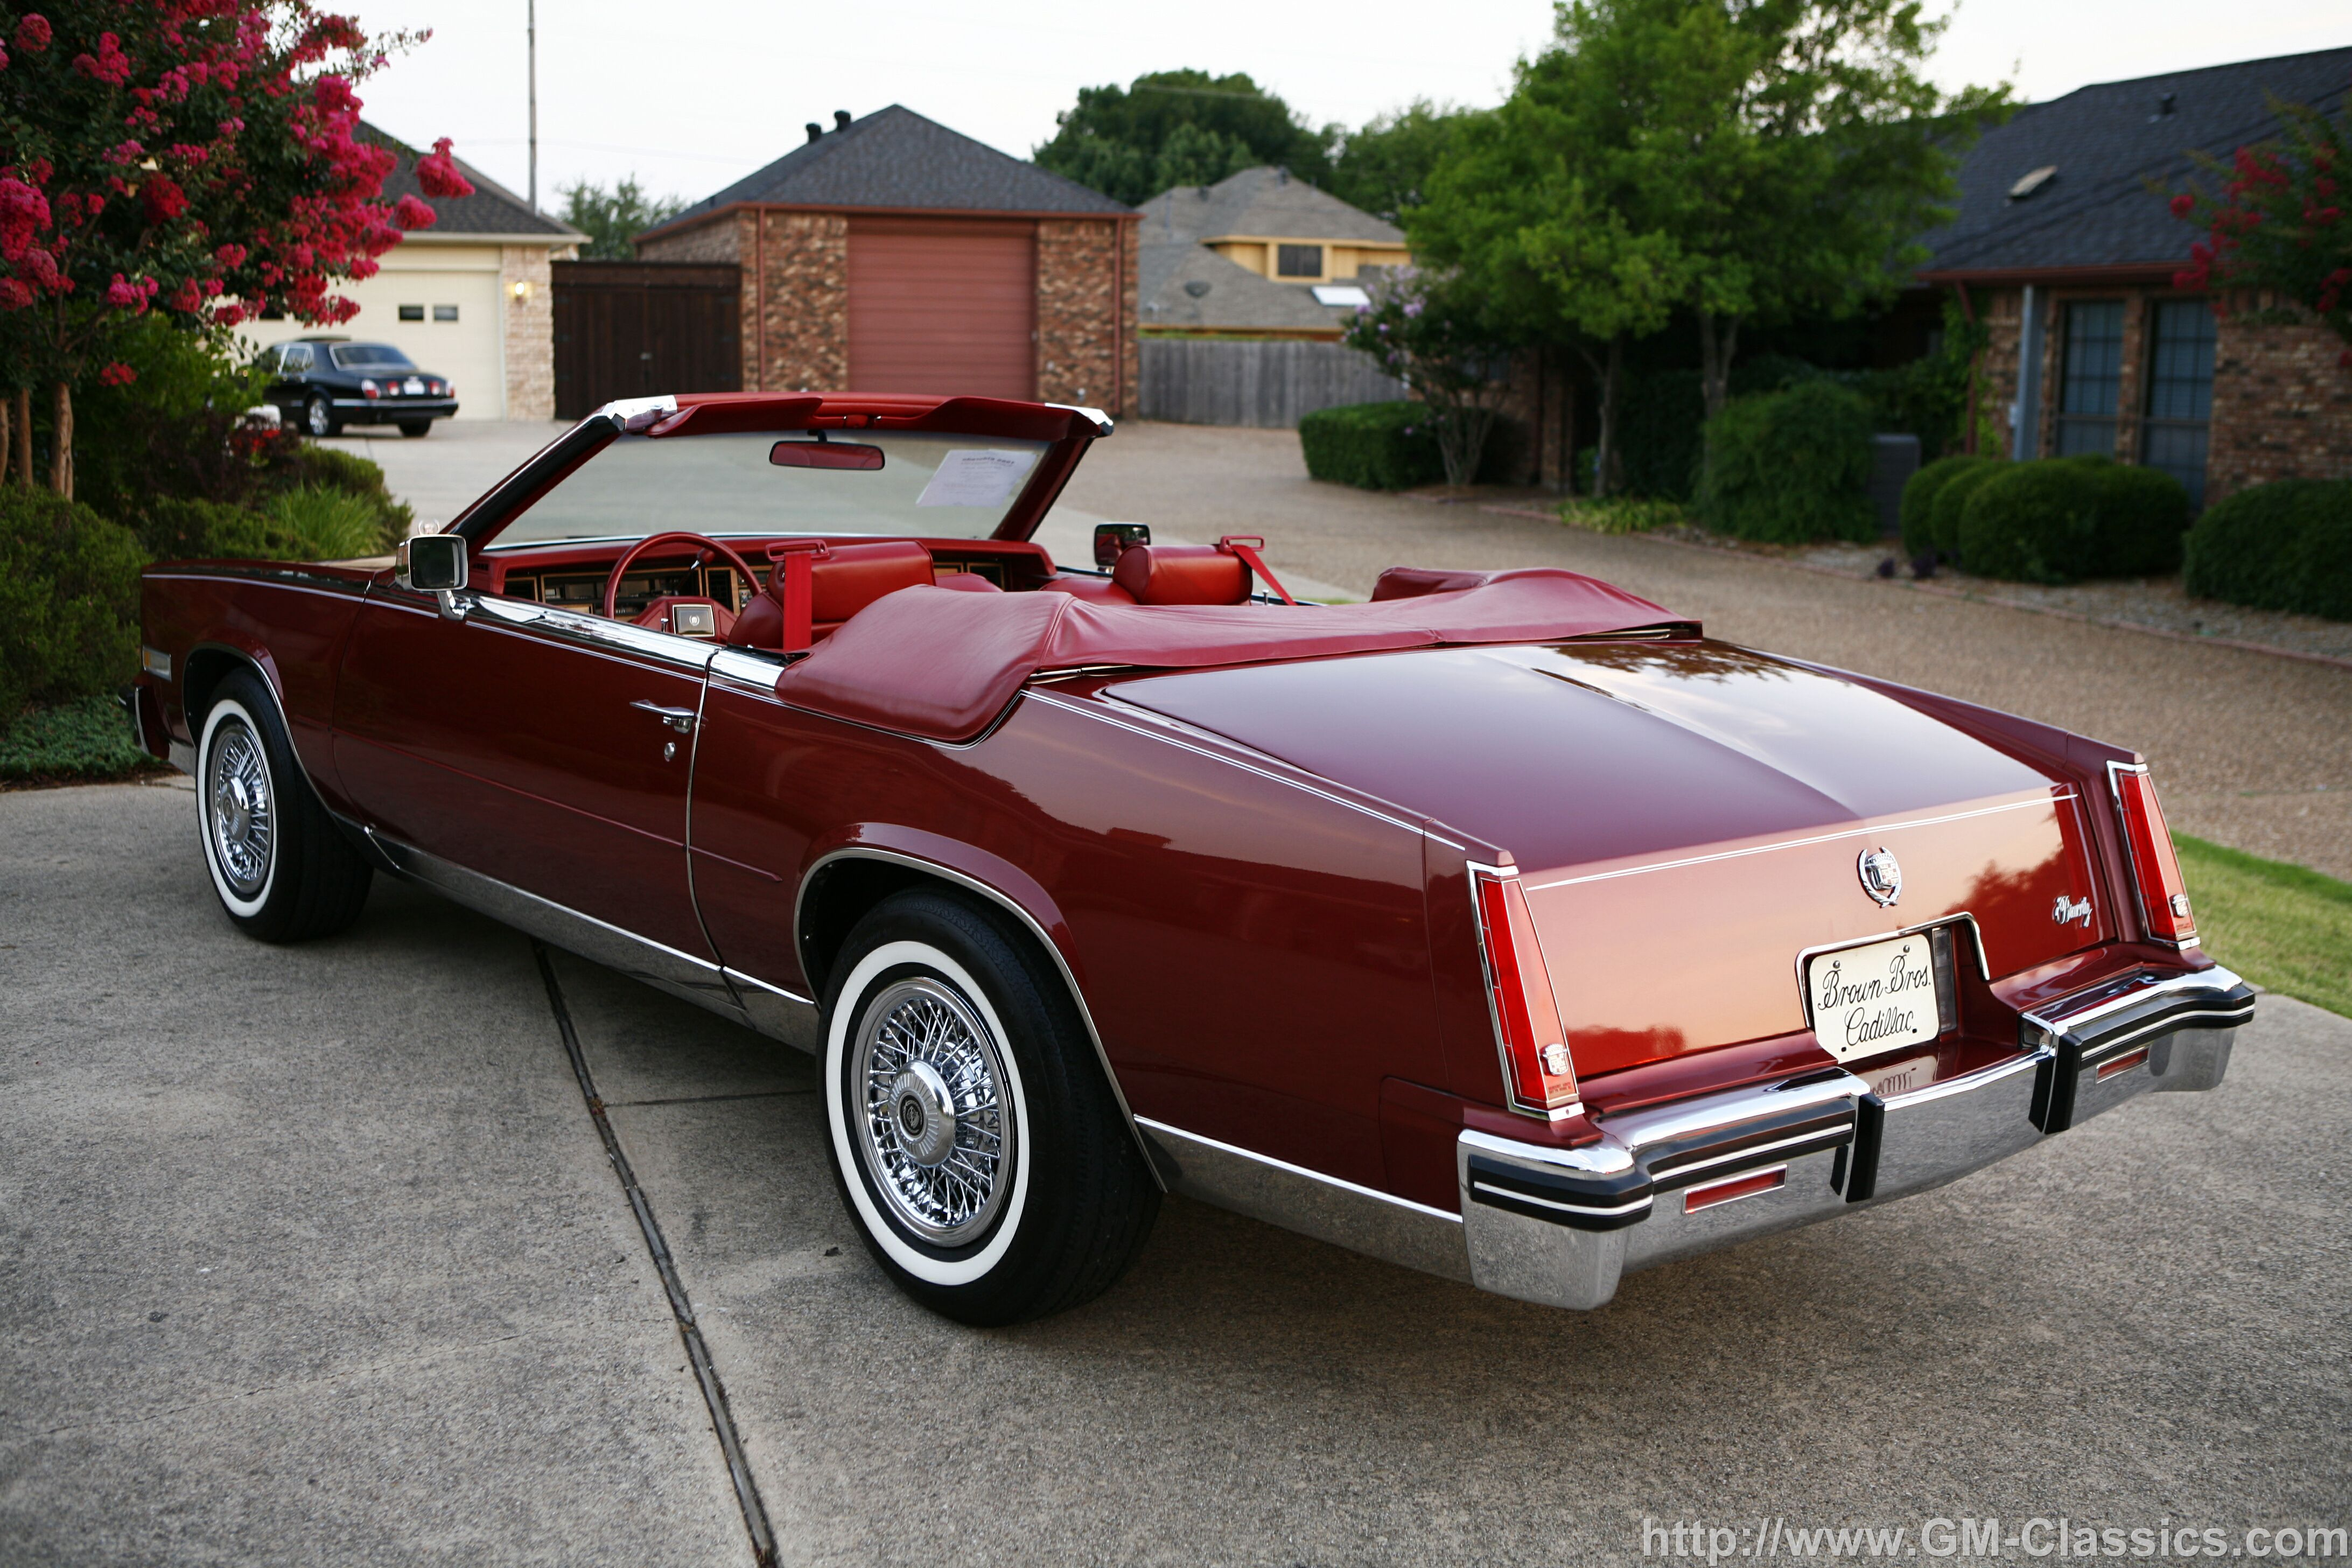 1985 Cadillac Eldorado Convertible - Matt Garrett 1c5a3e52bdc0